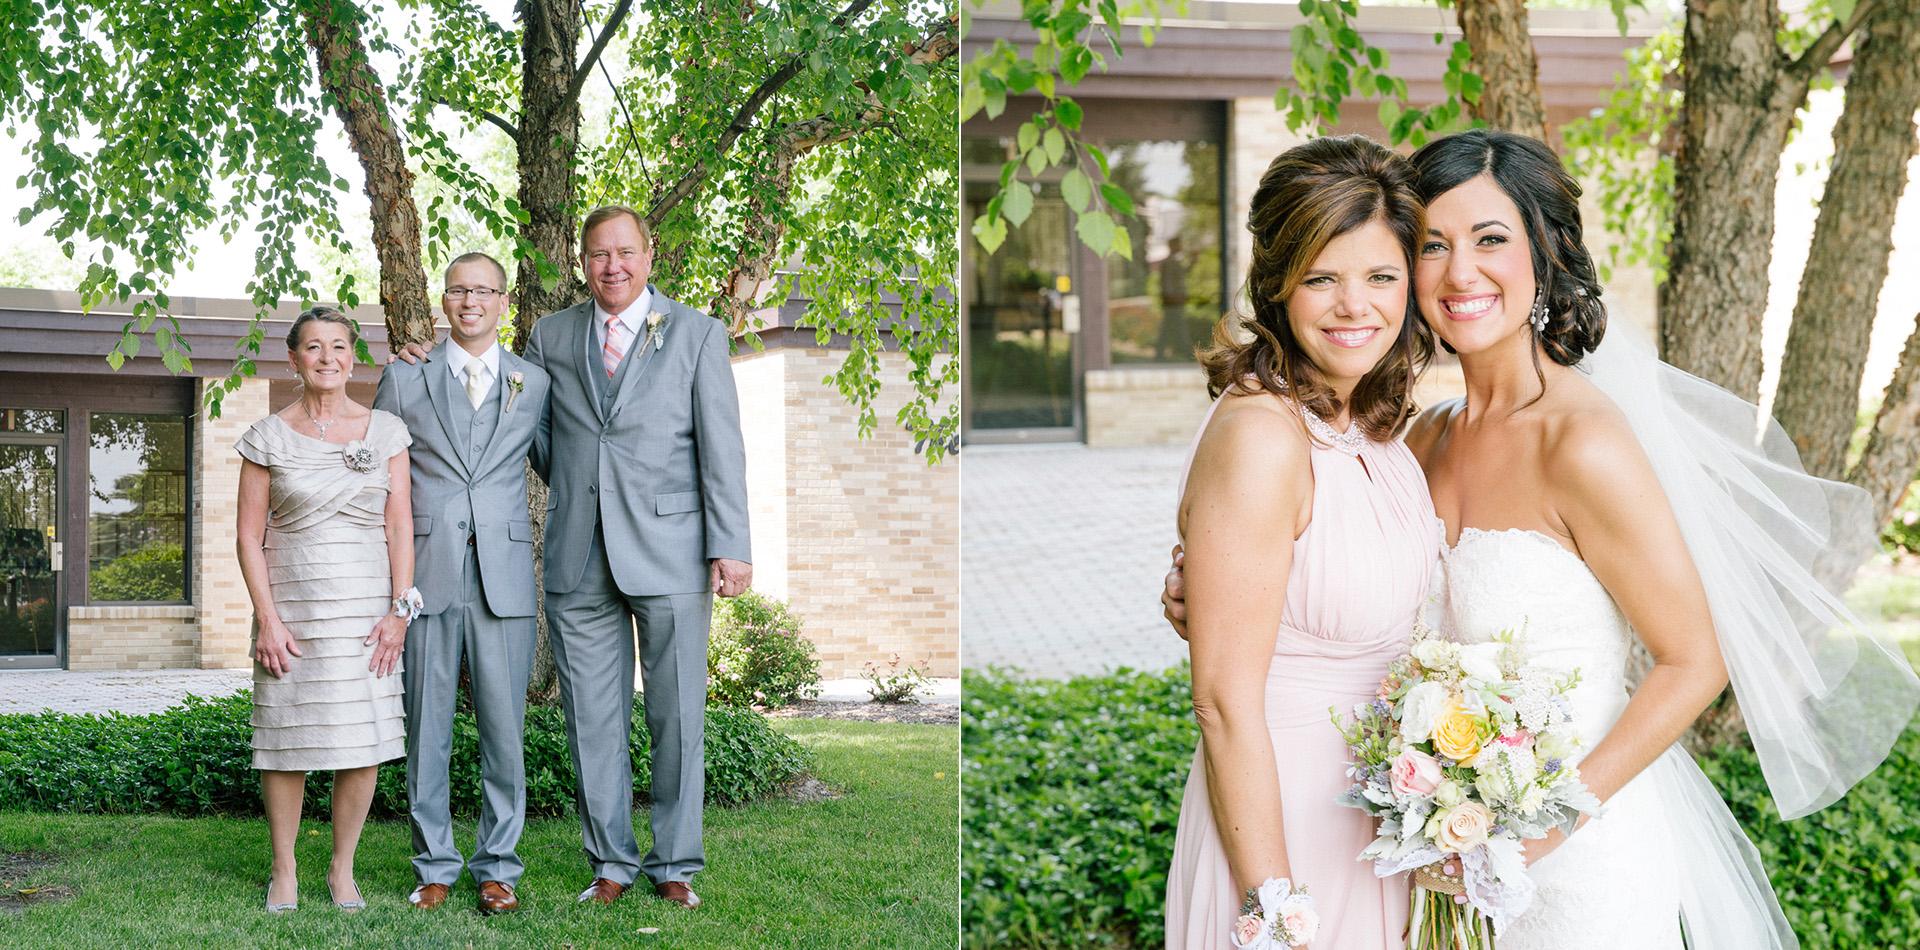 Ariel International Center Wedding Photos 24-1.jpg